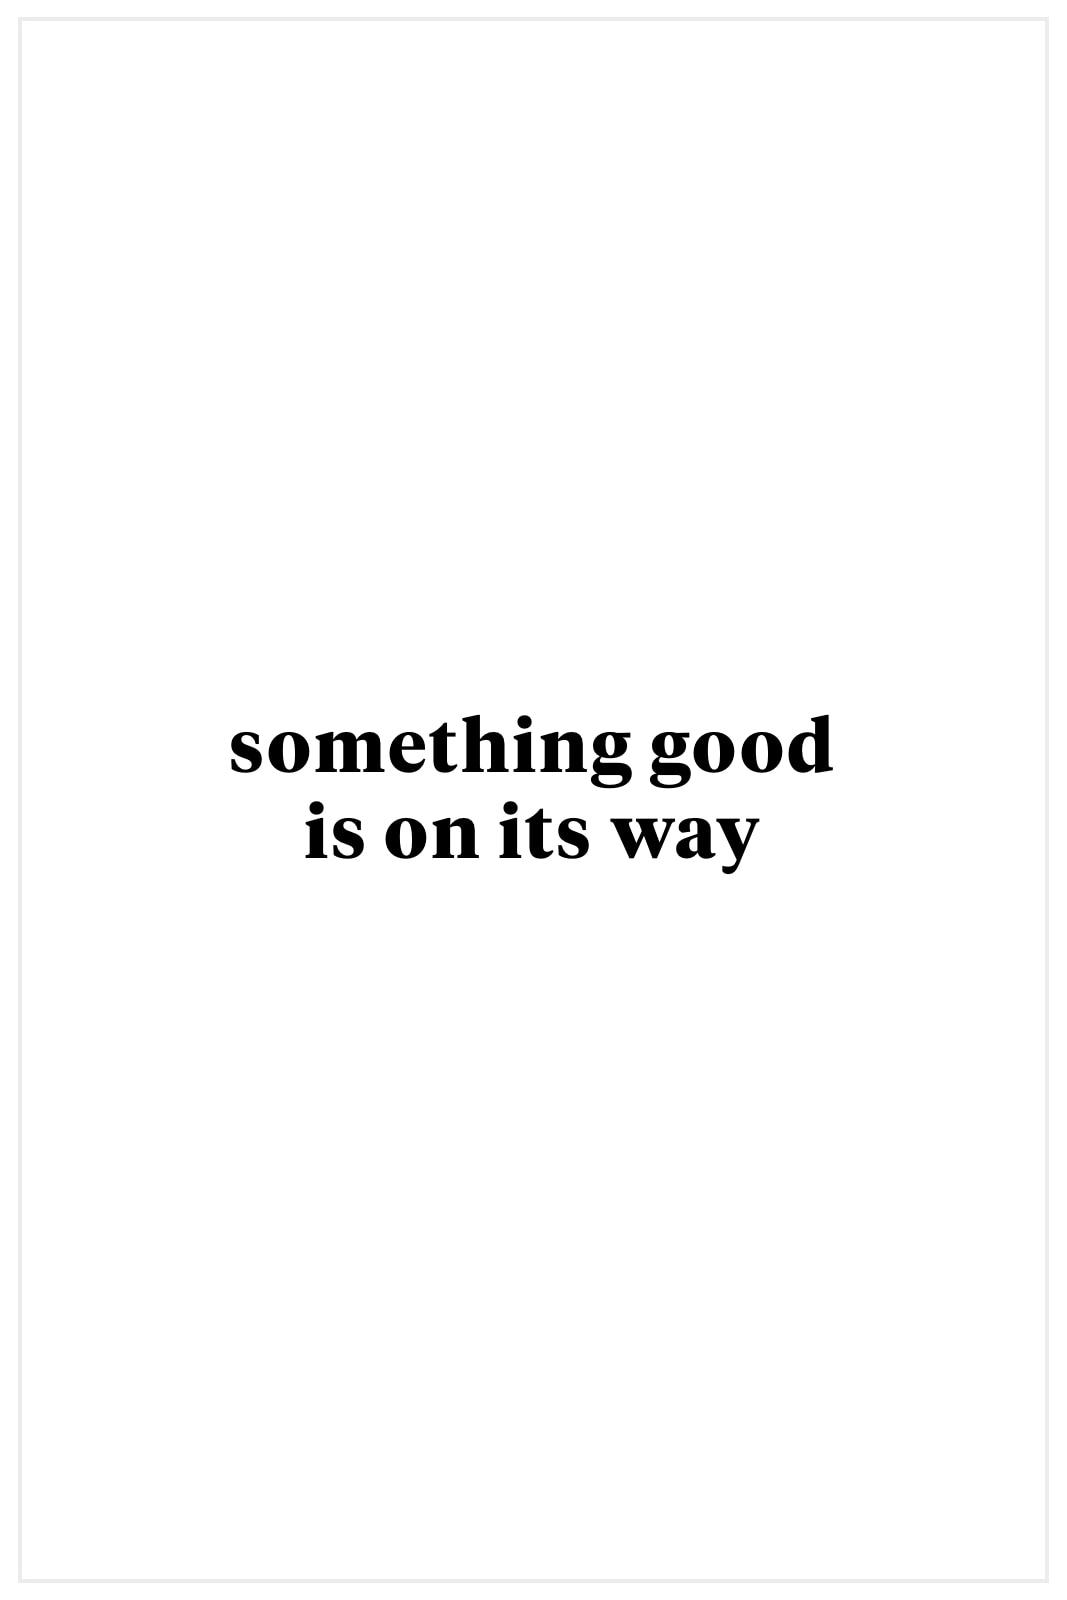 John and jenn Jonah Rainbow Dolman Sweater